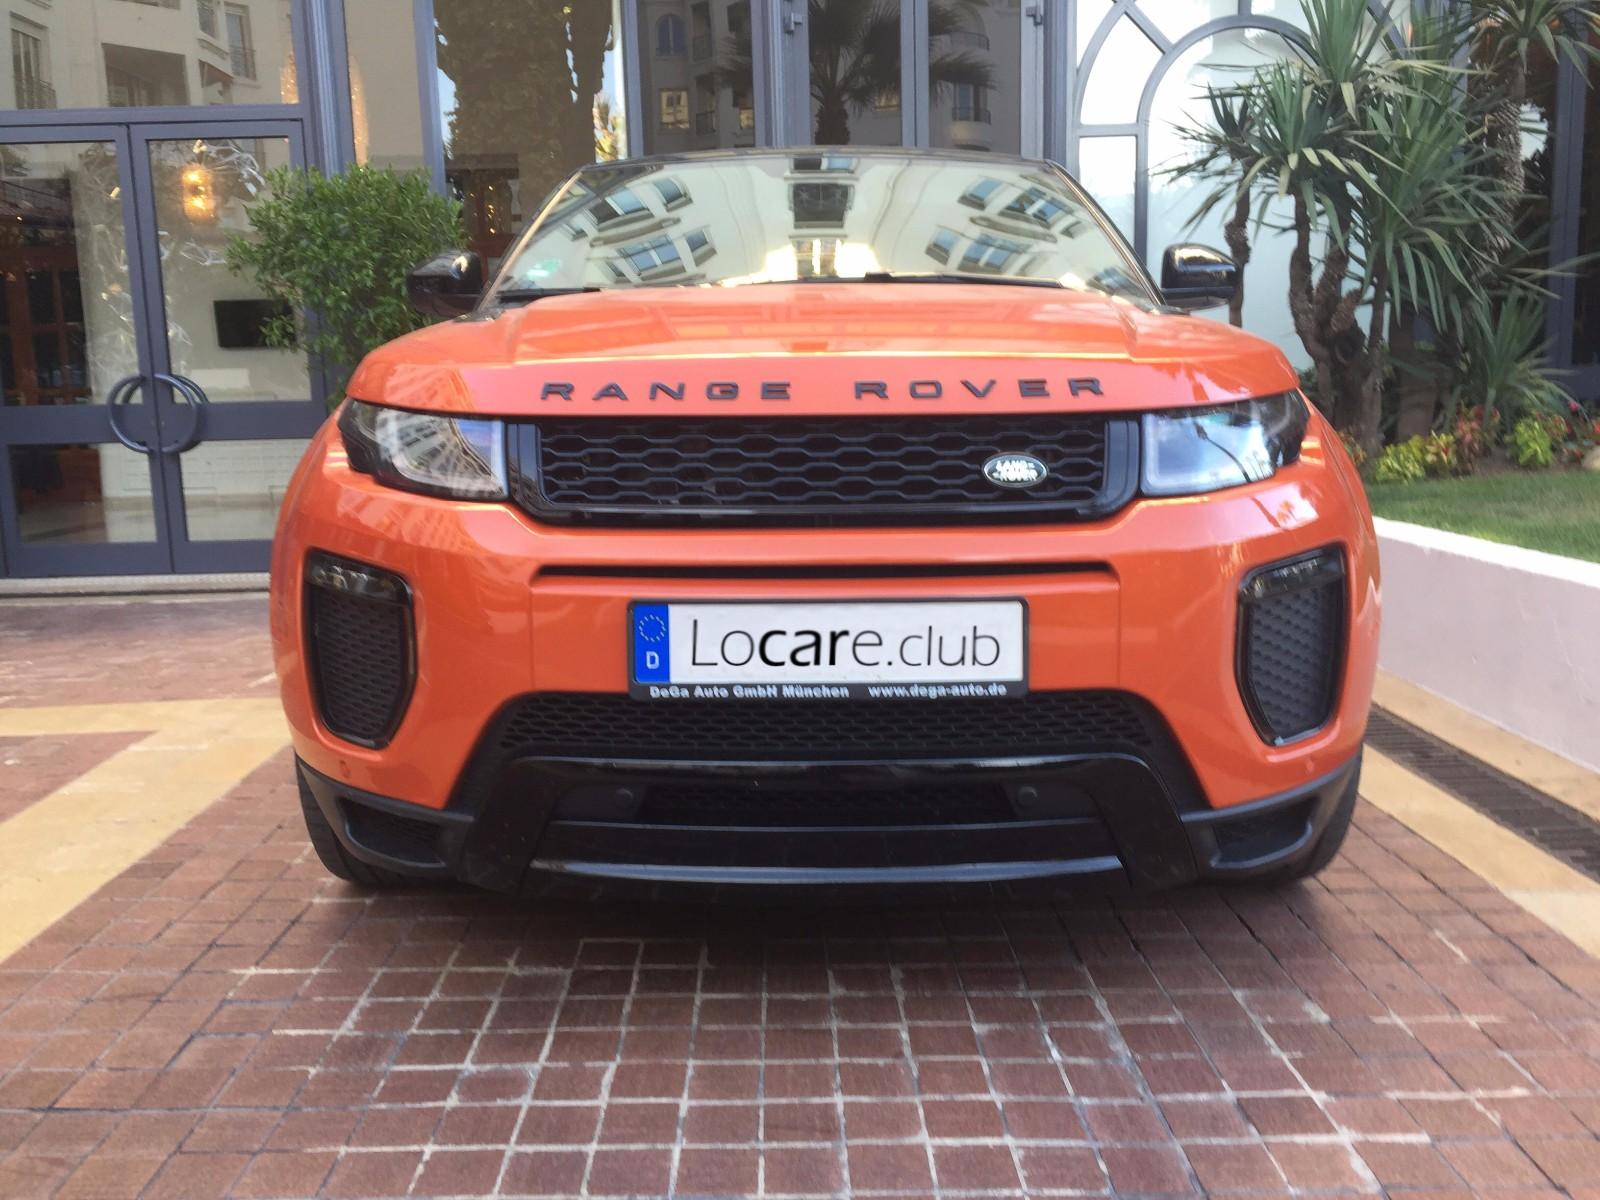 rent a land rover range rover evoque cabrio in nice cannes monaco by luxury car. Black Bedroom Furniture Sets. Home Design Ideas